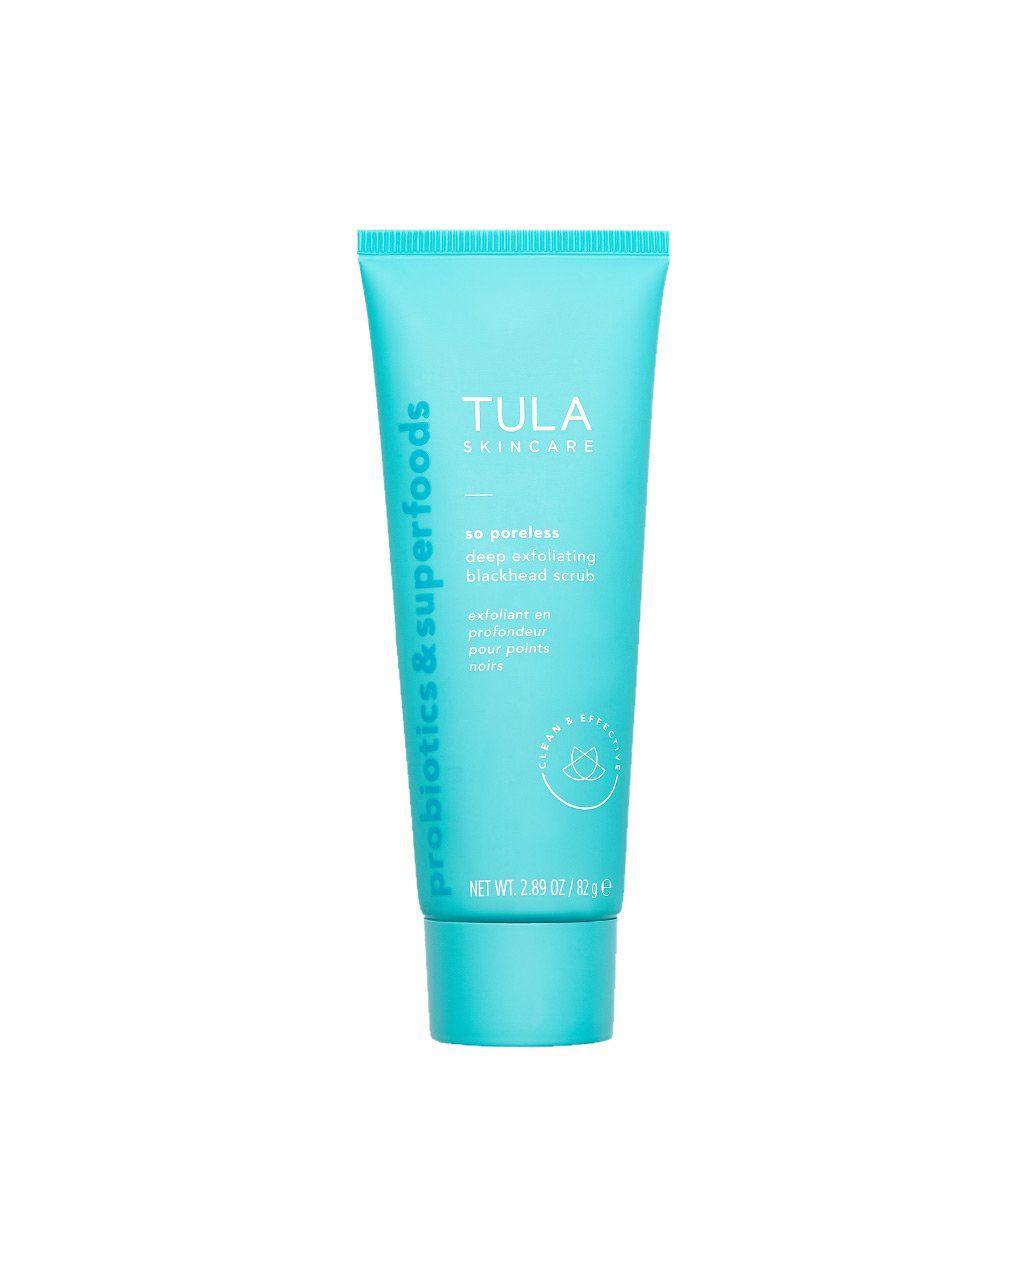 Tula Deep Exfoliating Blackhead Scrub